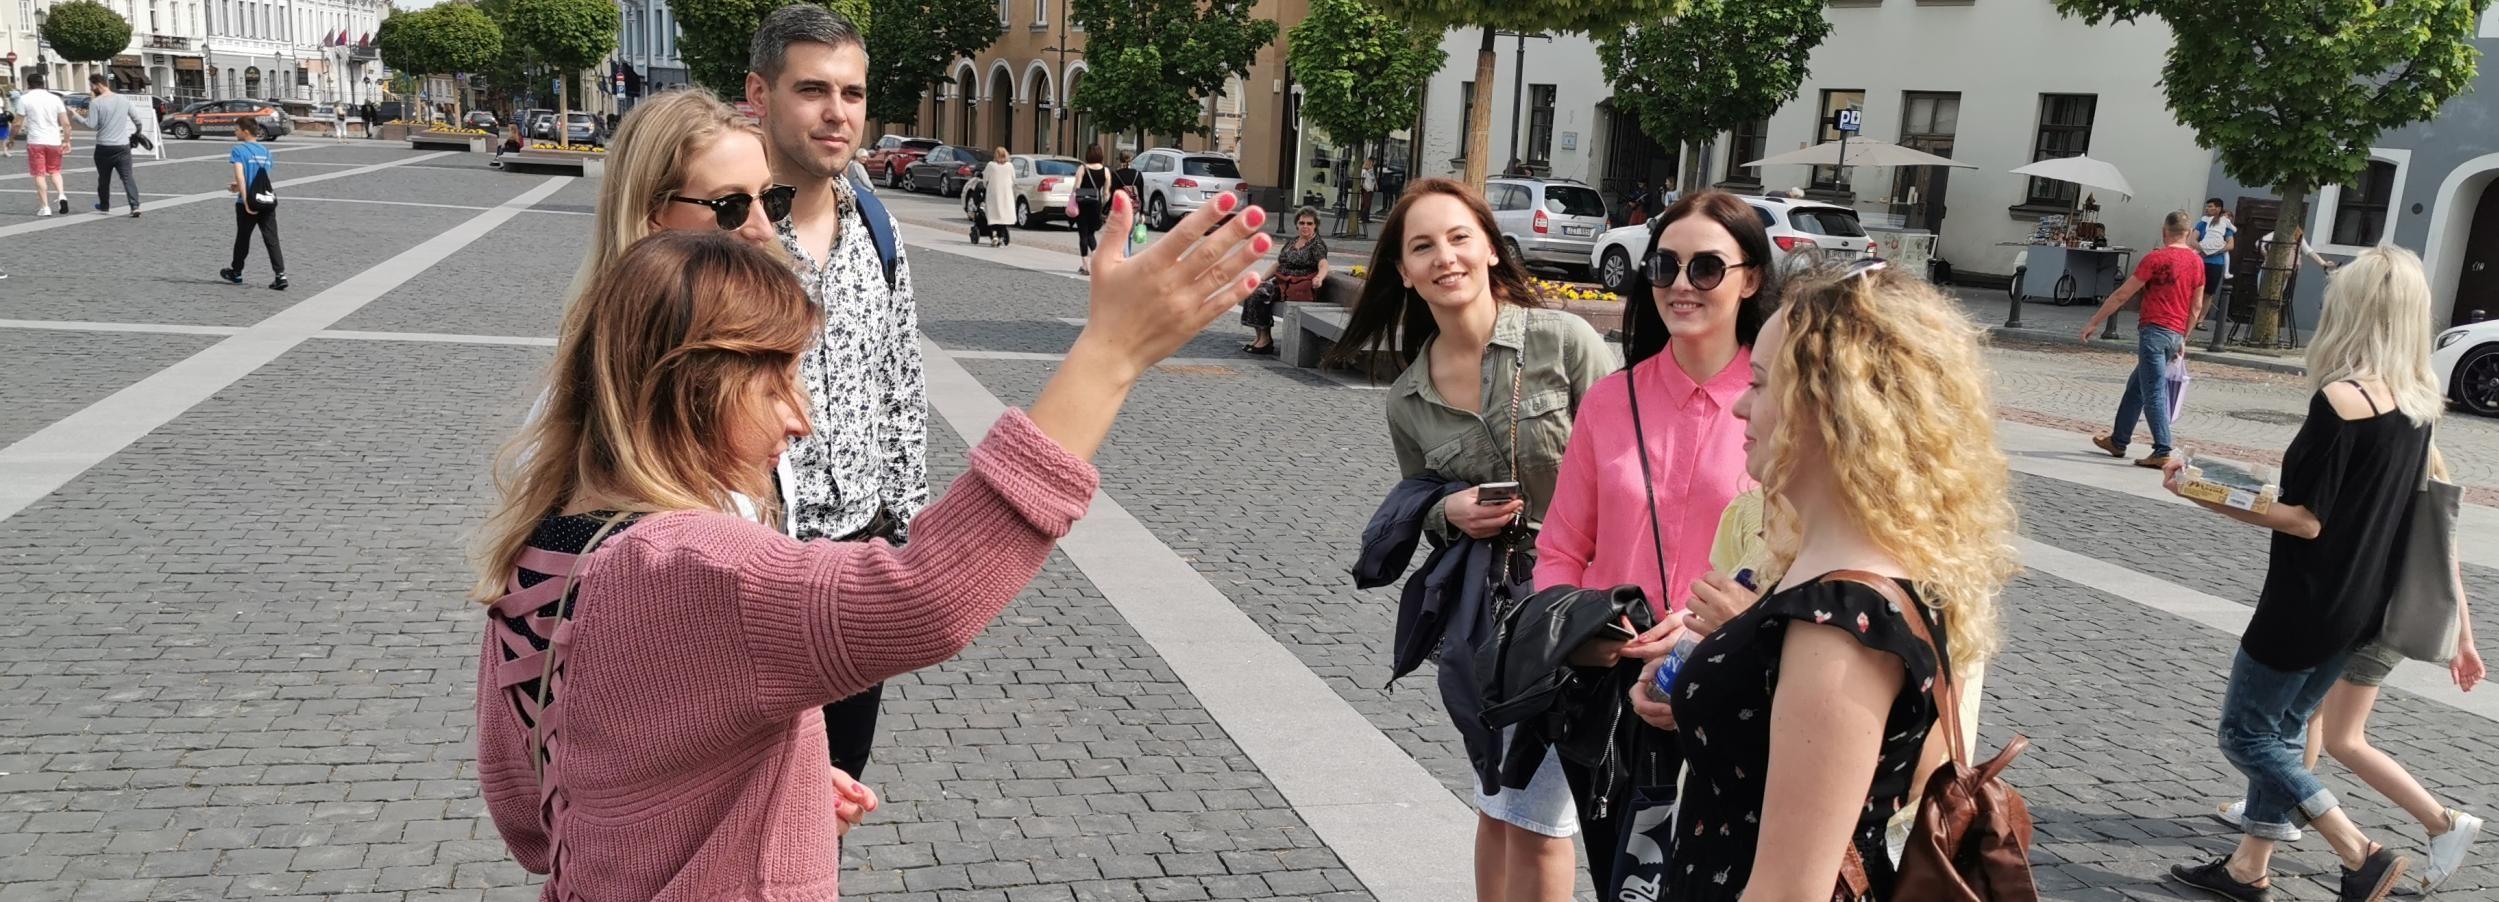 Vilnius: destaques da cidade a pé